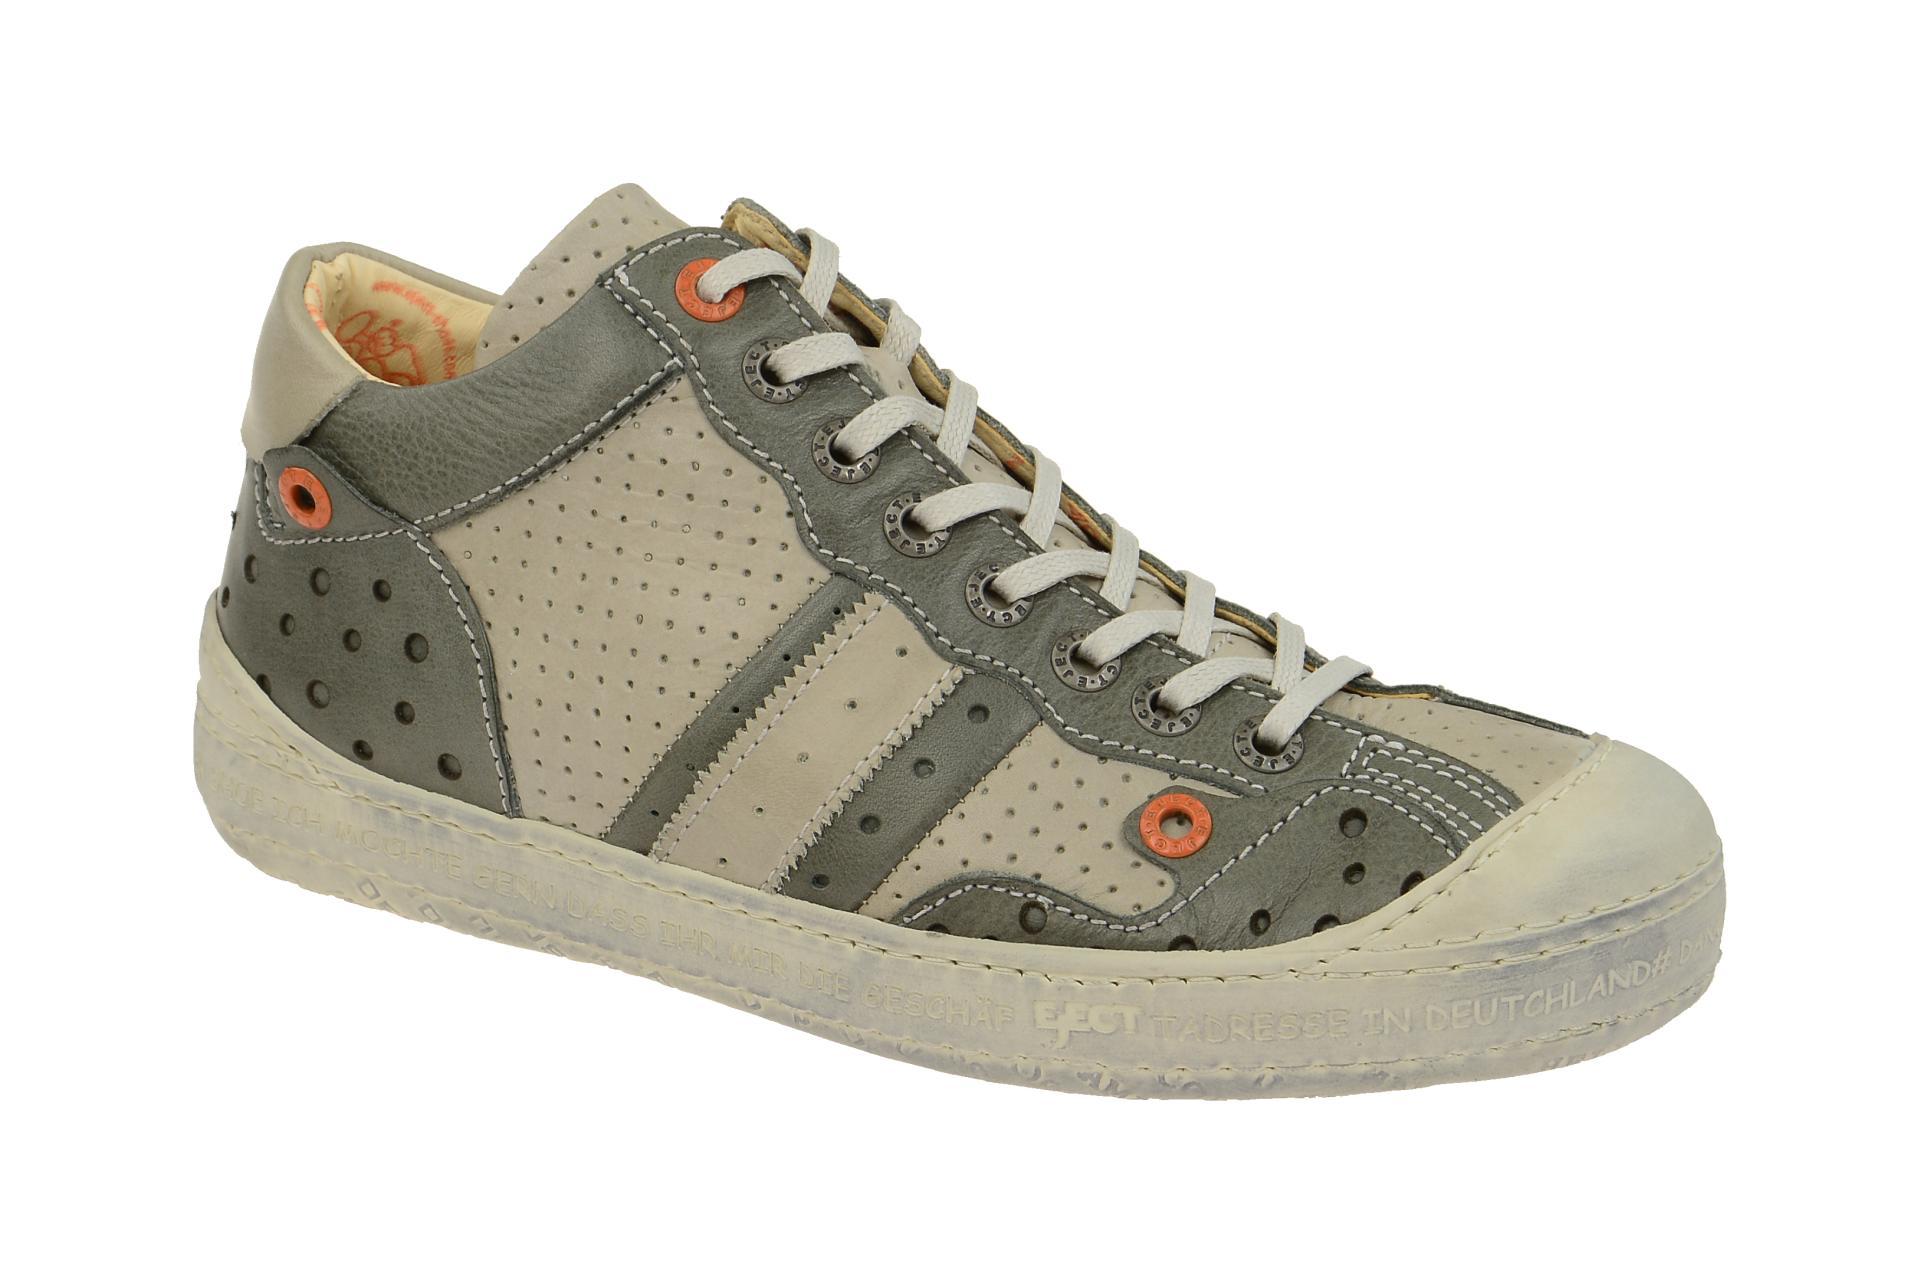 Eject Sneakers, grau, hellgrau